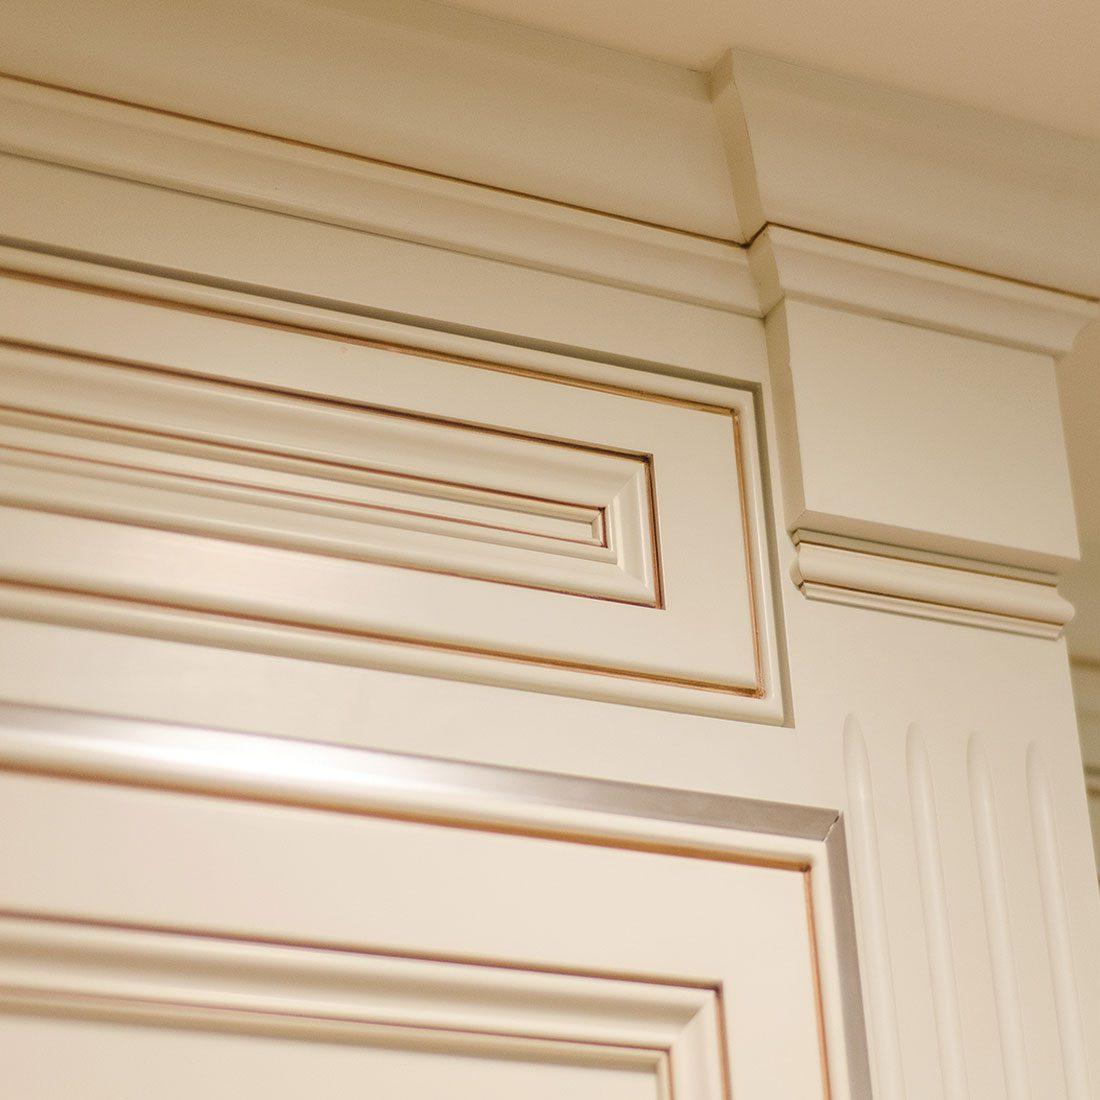 San Jose Kitchen Cabinets Kitchen Cabinets 101 Ideas To Choose Design Case San Jose